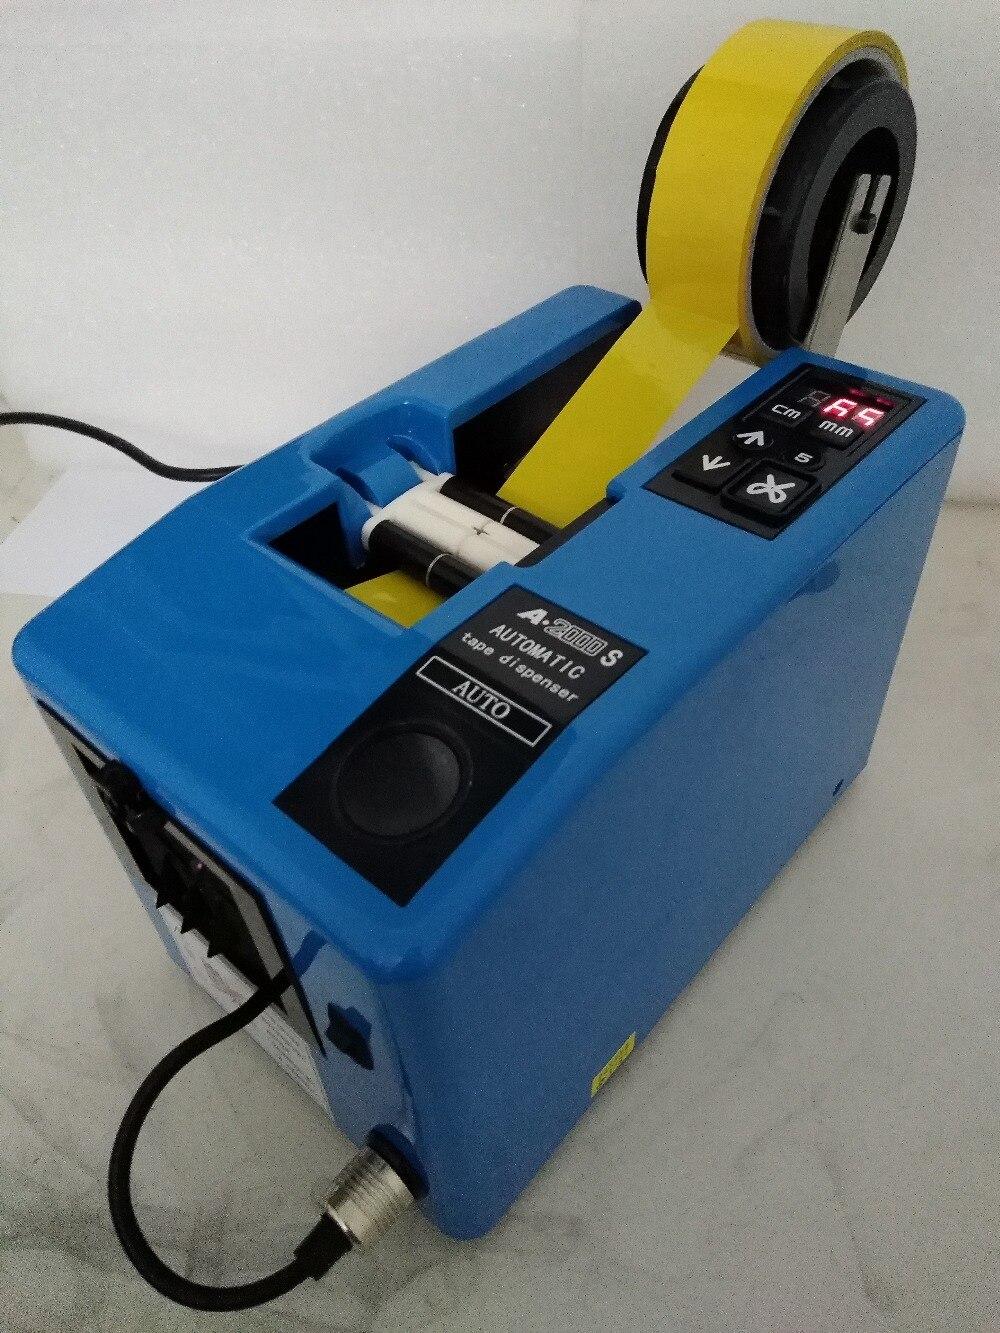 Handif automatic tape dispenser Both Adhesive and No adhesive A2000S kitlee40100quar4210 value kit survivor tyvek expansion mailer quar4210 and lee ultimate stamp dispenser lee40100